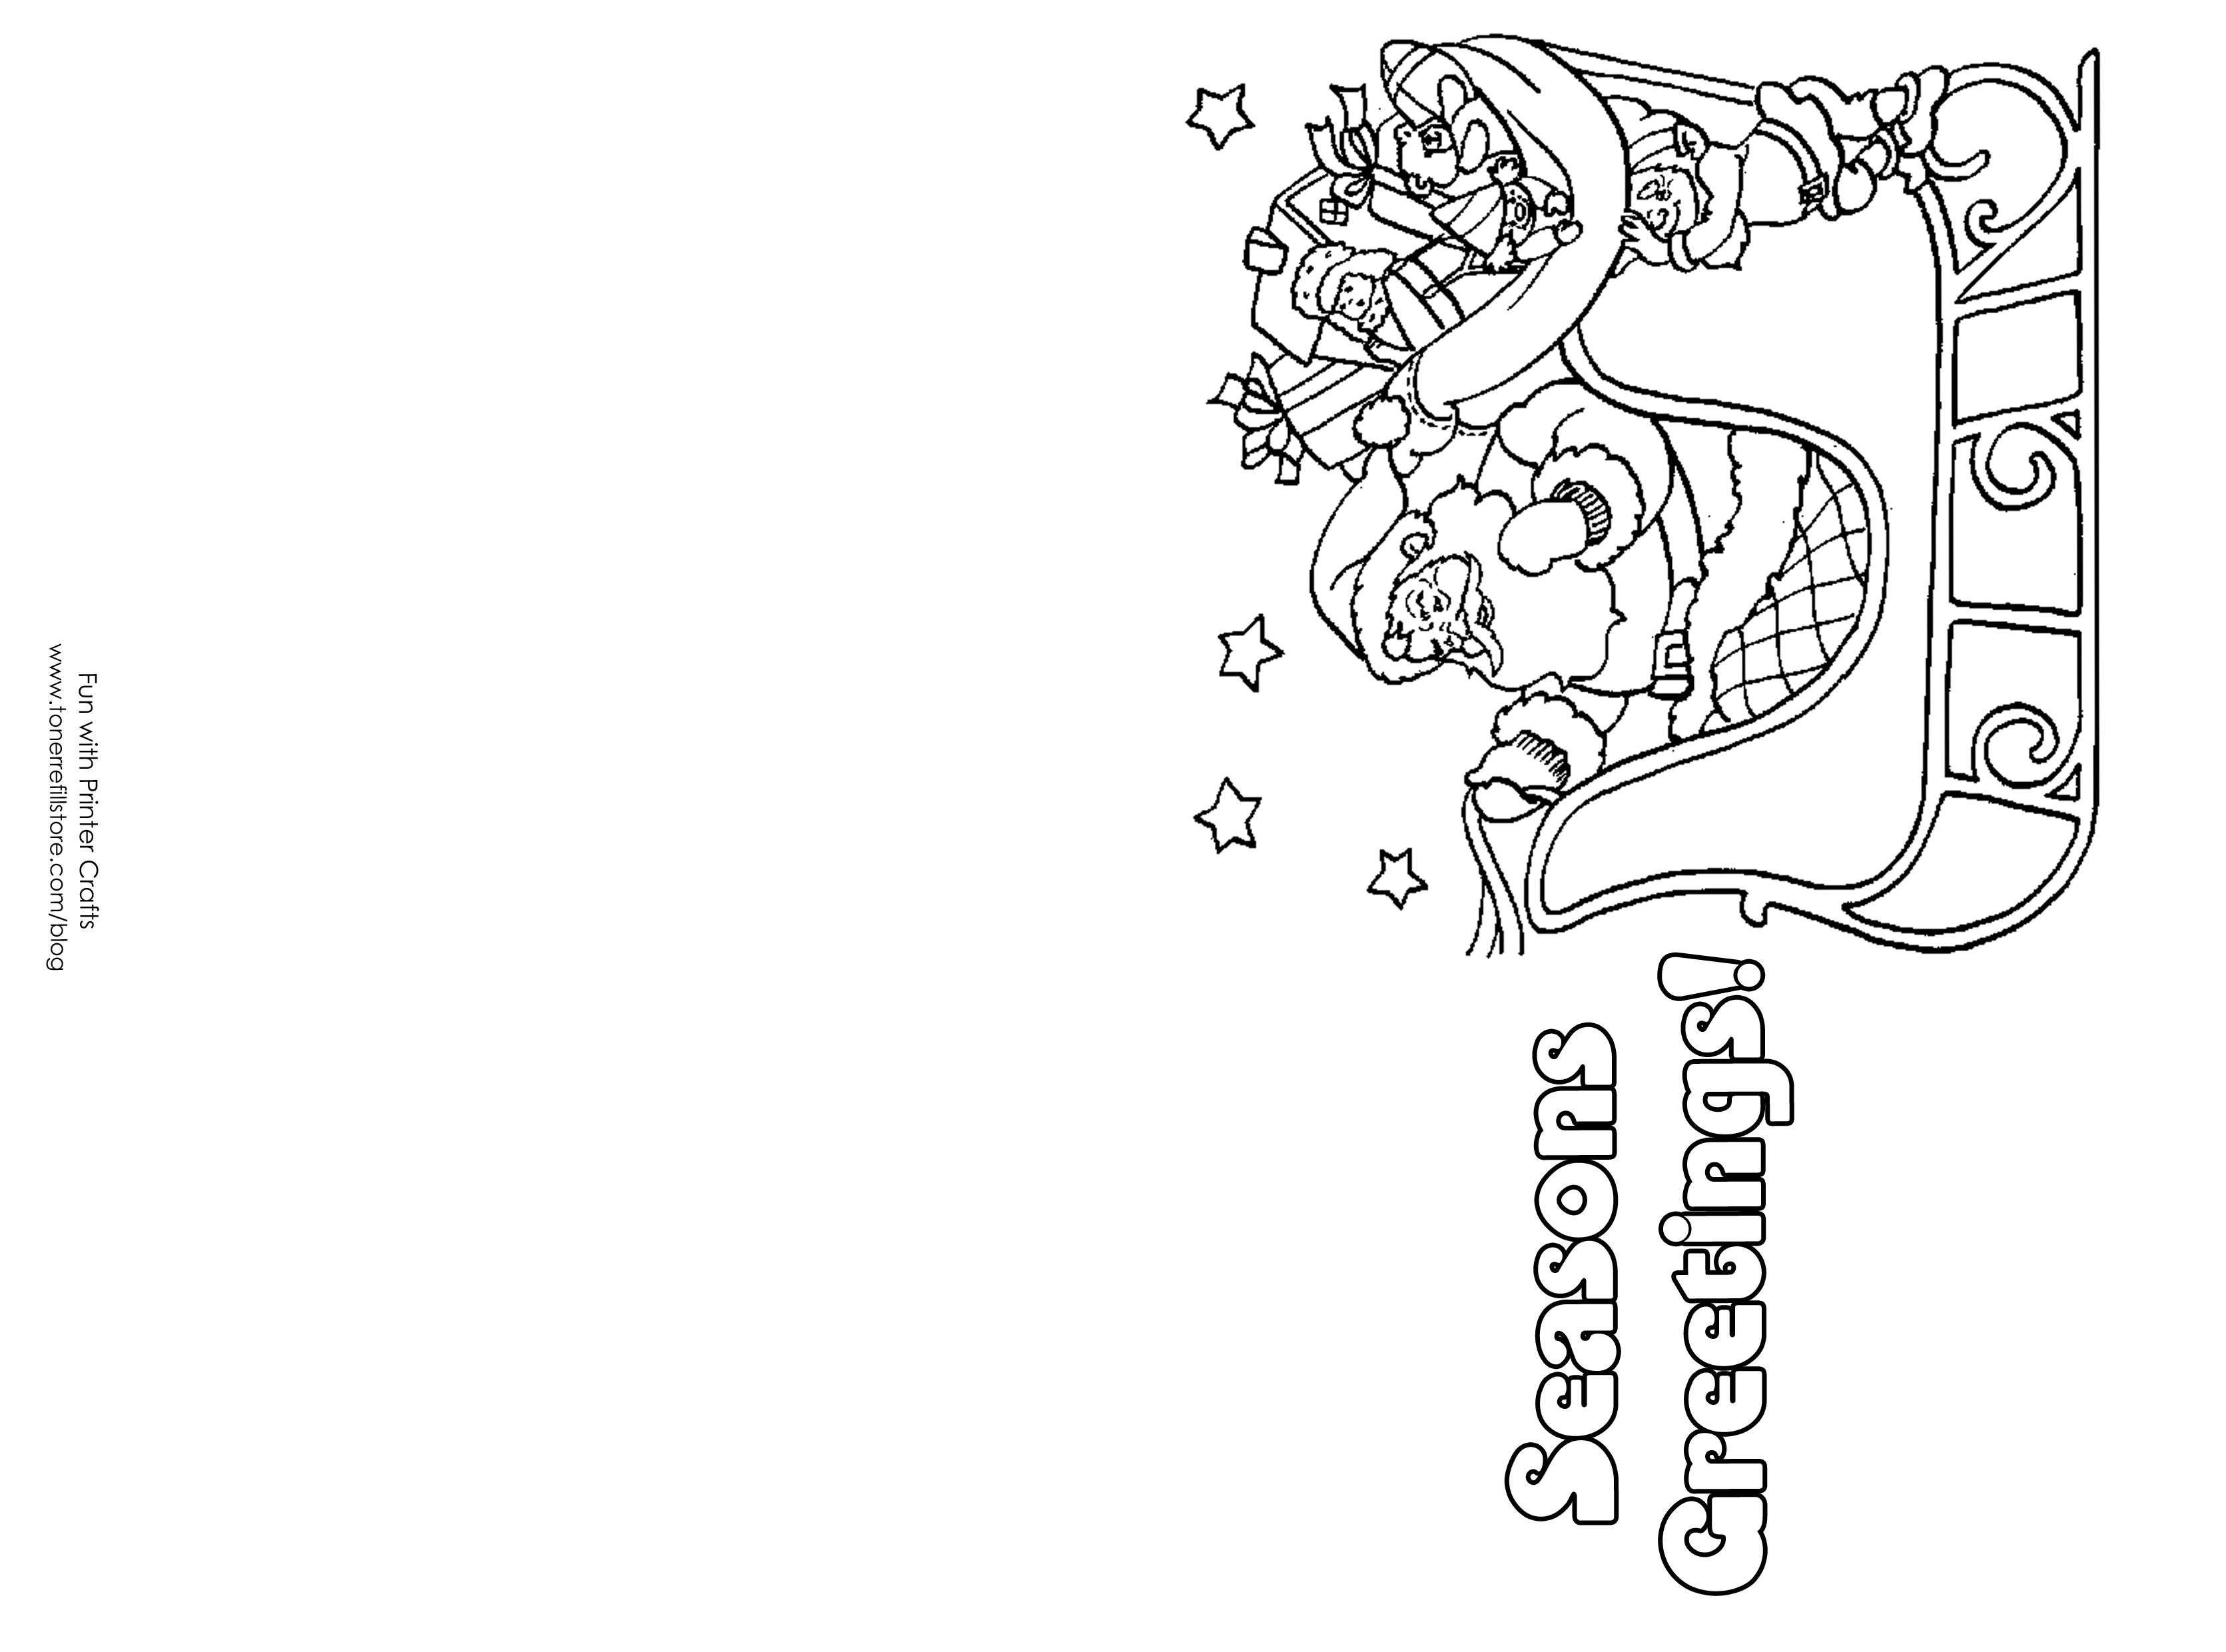 free coloring christmas cards christmas tree coloring pages hellokidscom coloring cards free christmas